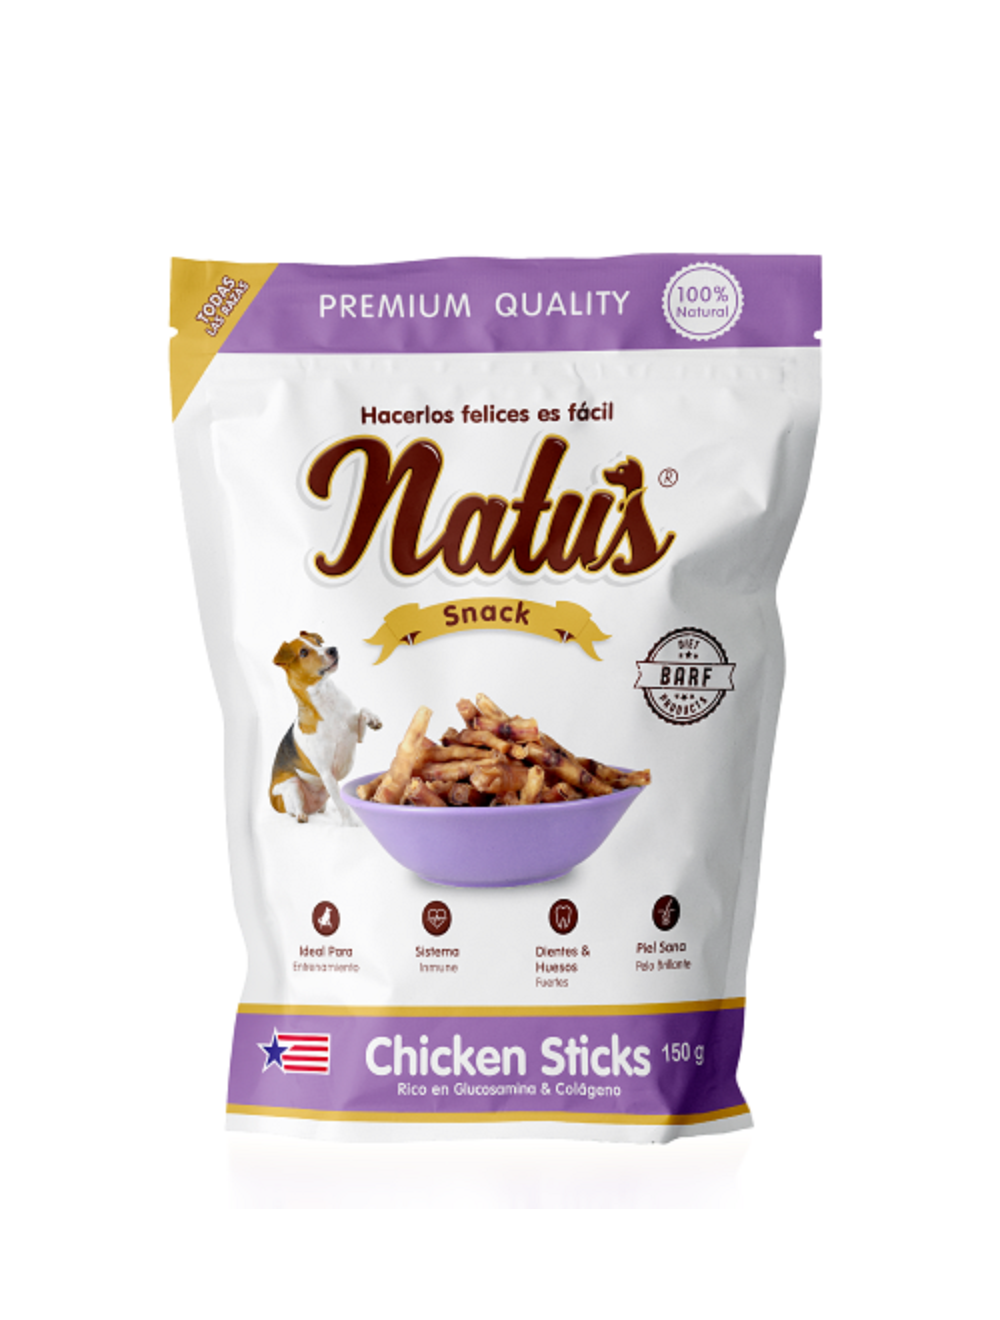 Natus Snacks Chicken Sticks